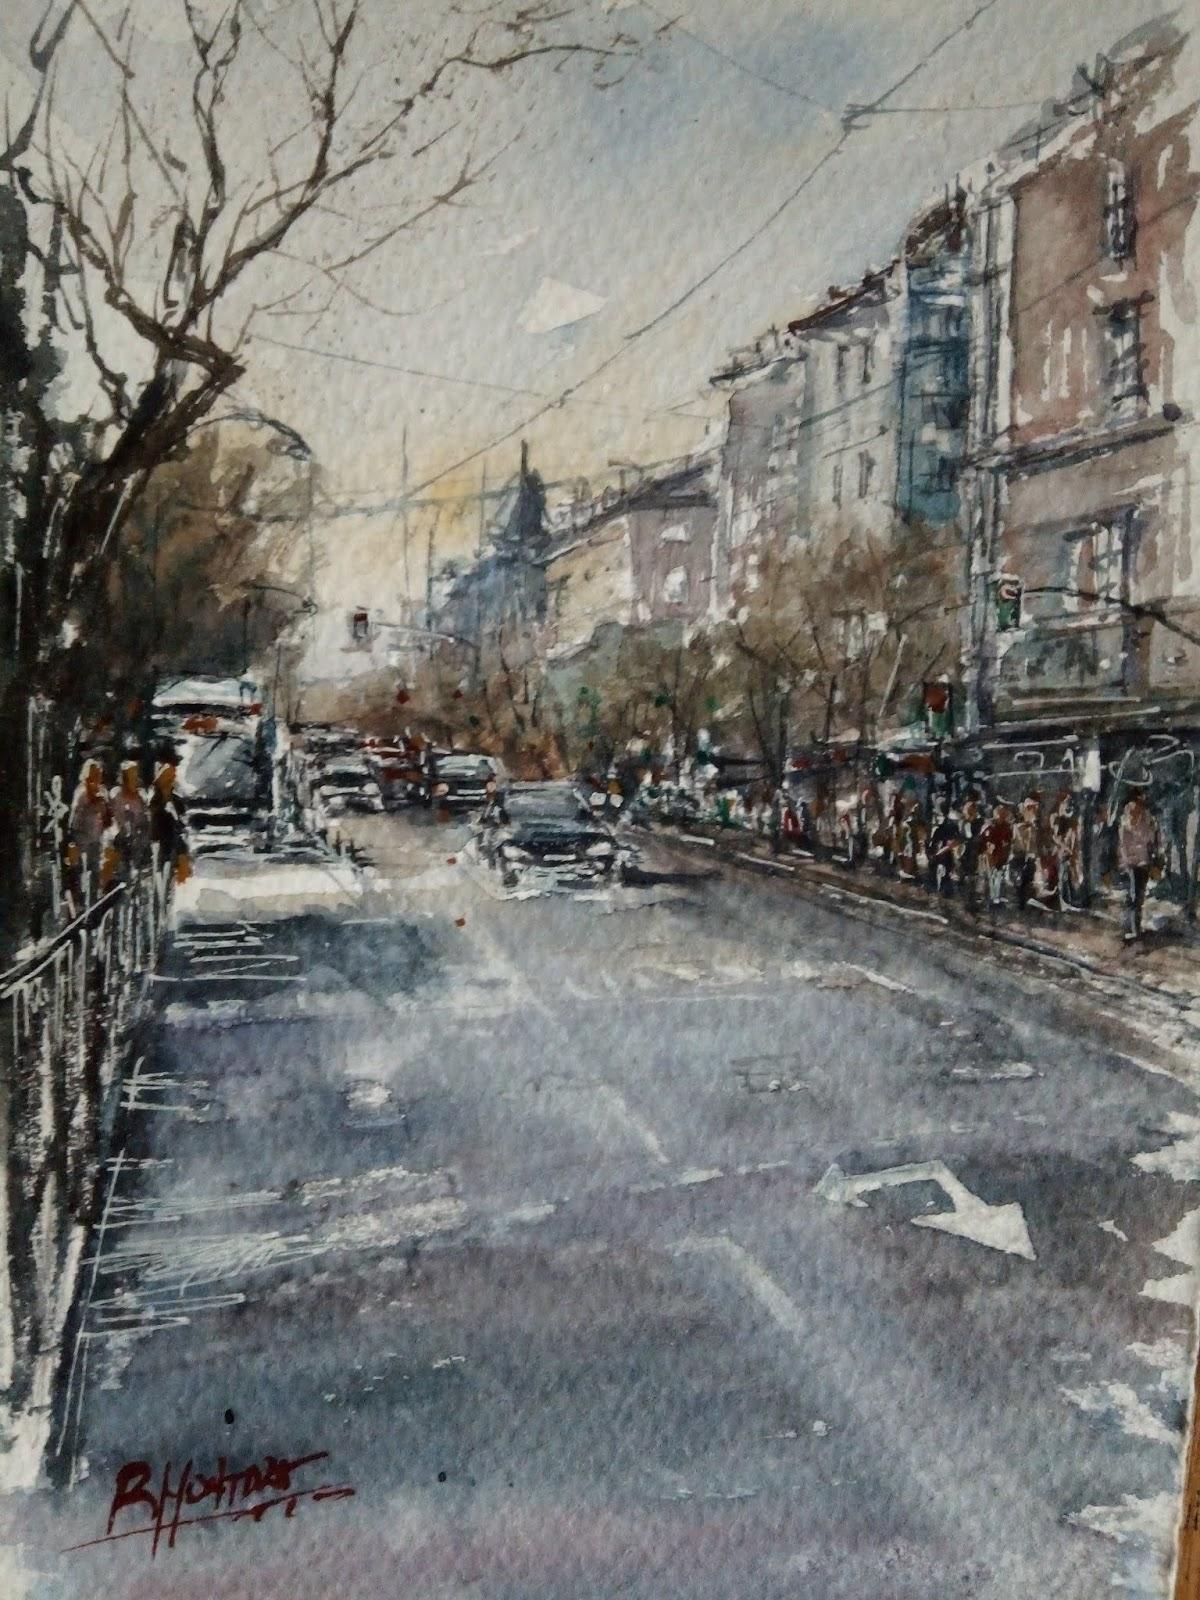 ACUARELAS : Paisajes urbanos de Madrid